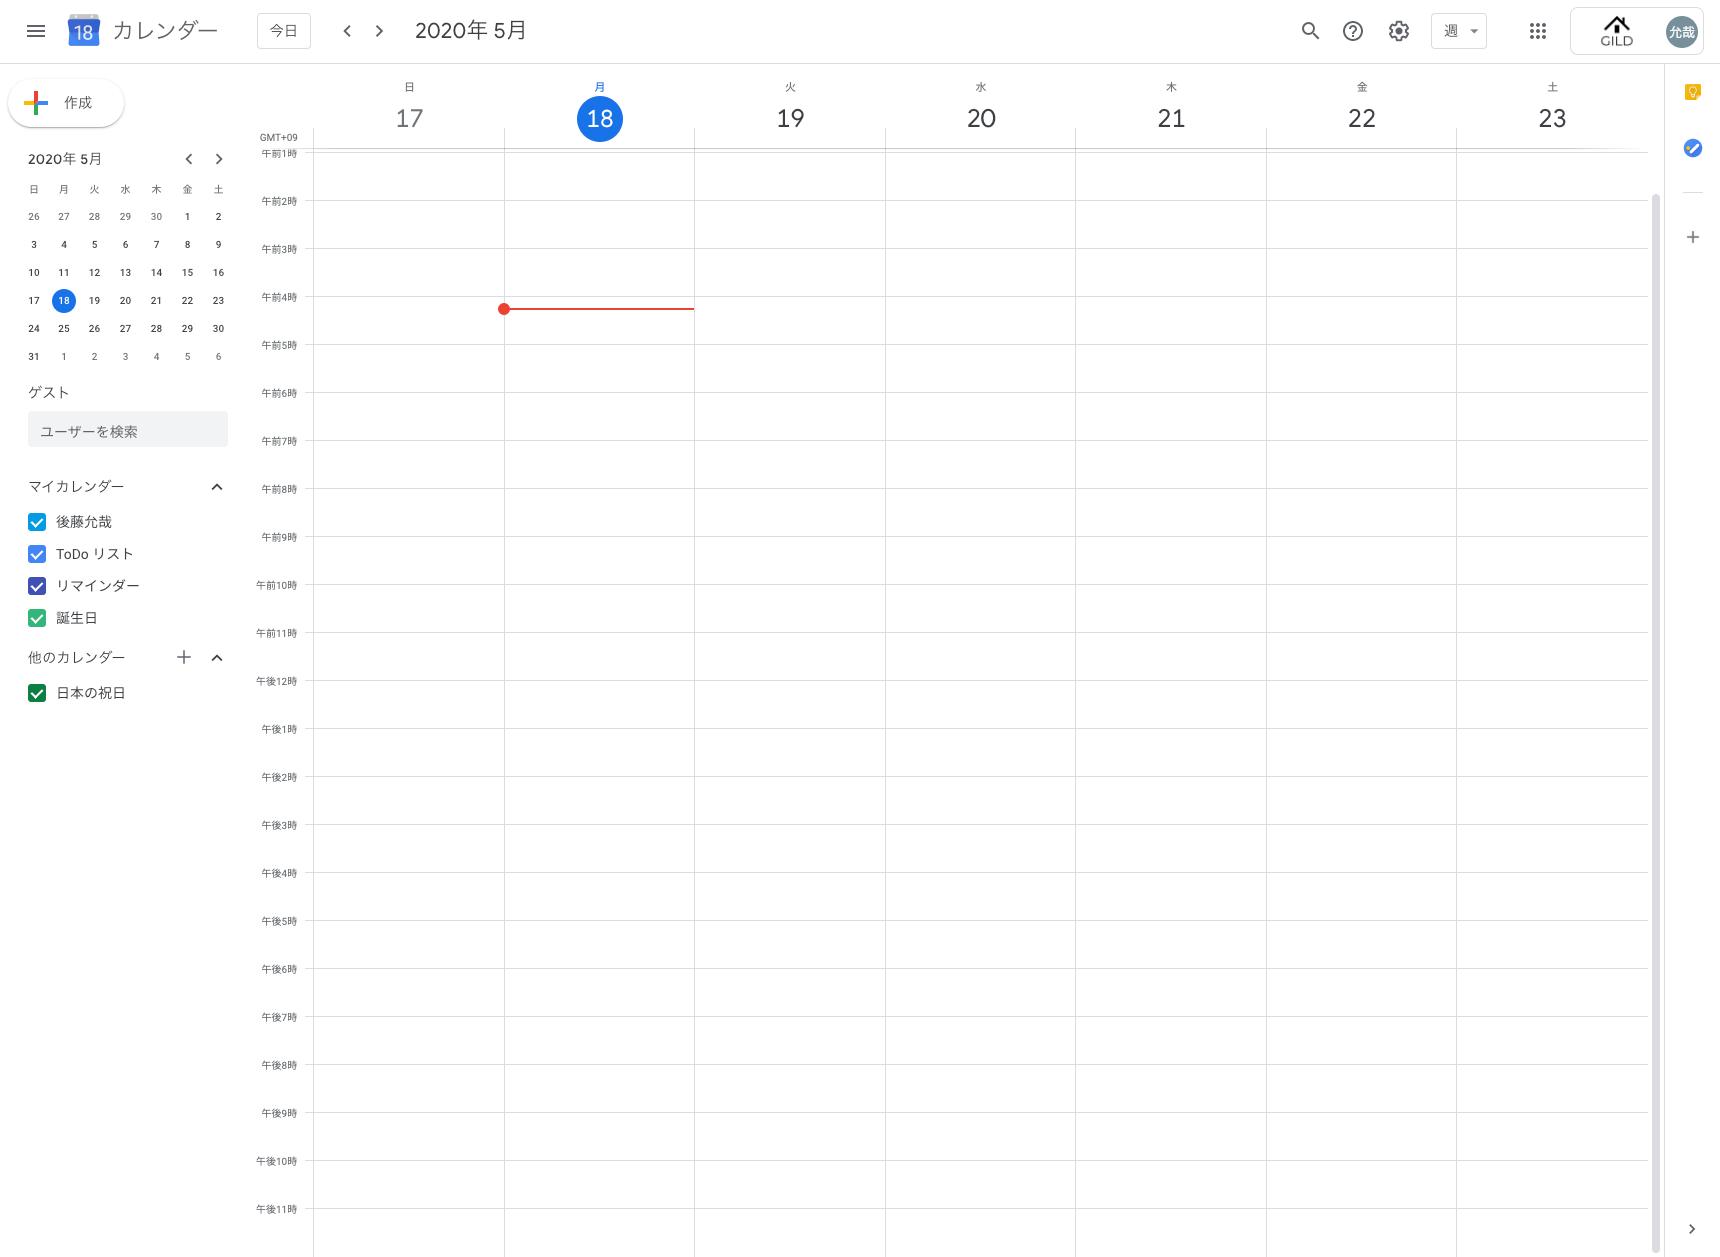 FireShot Capture 012 - 株式会社GILD - カレンダー - 2020年 5月 17日の週 - calendar.google.com.png